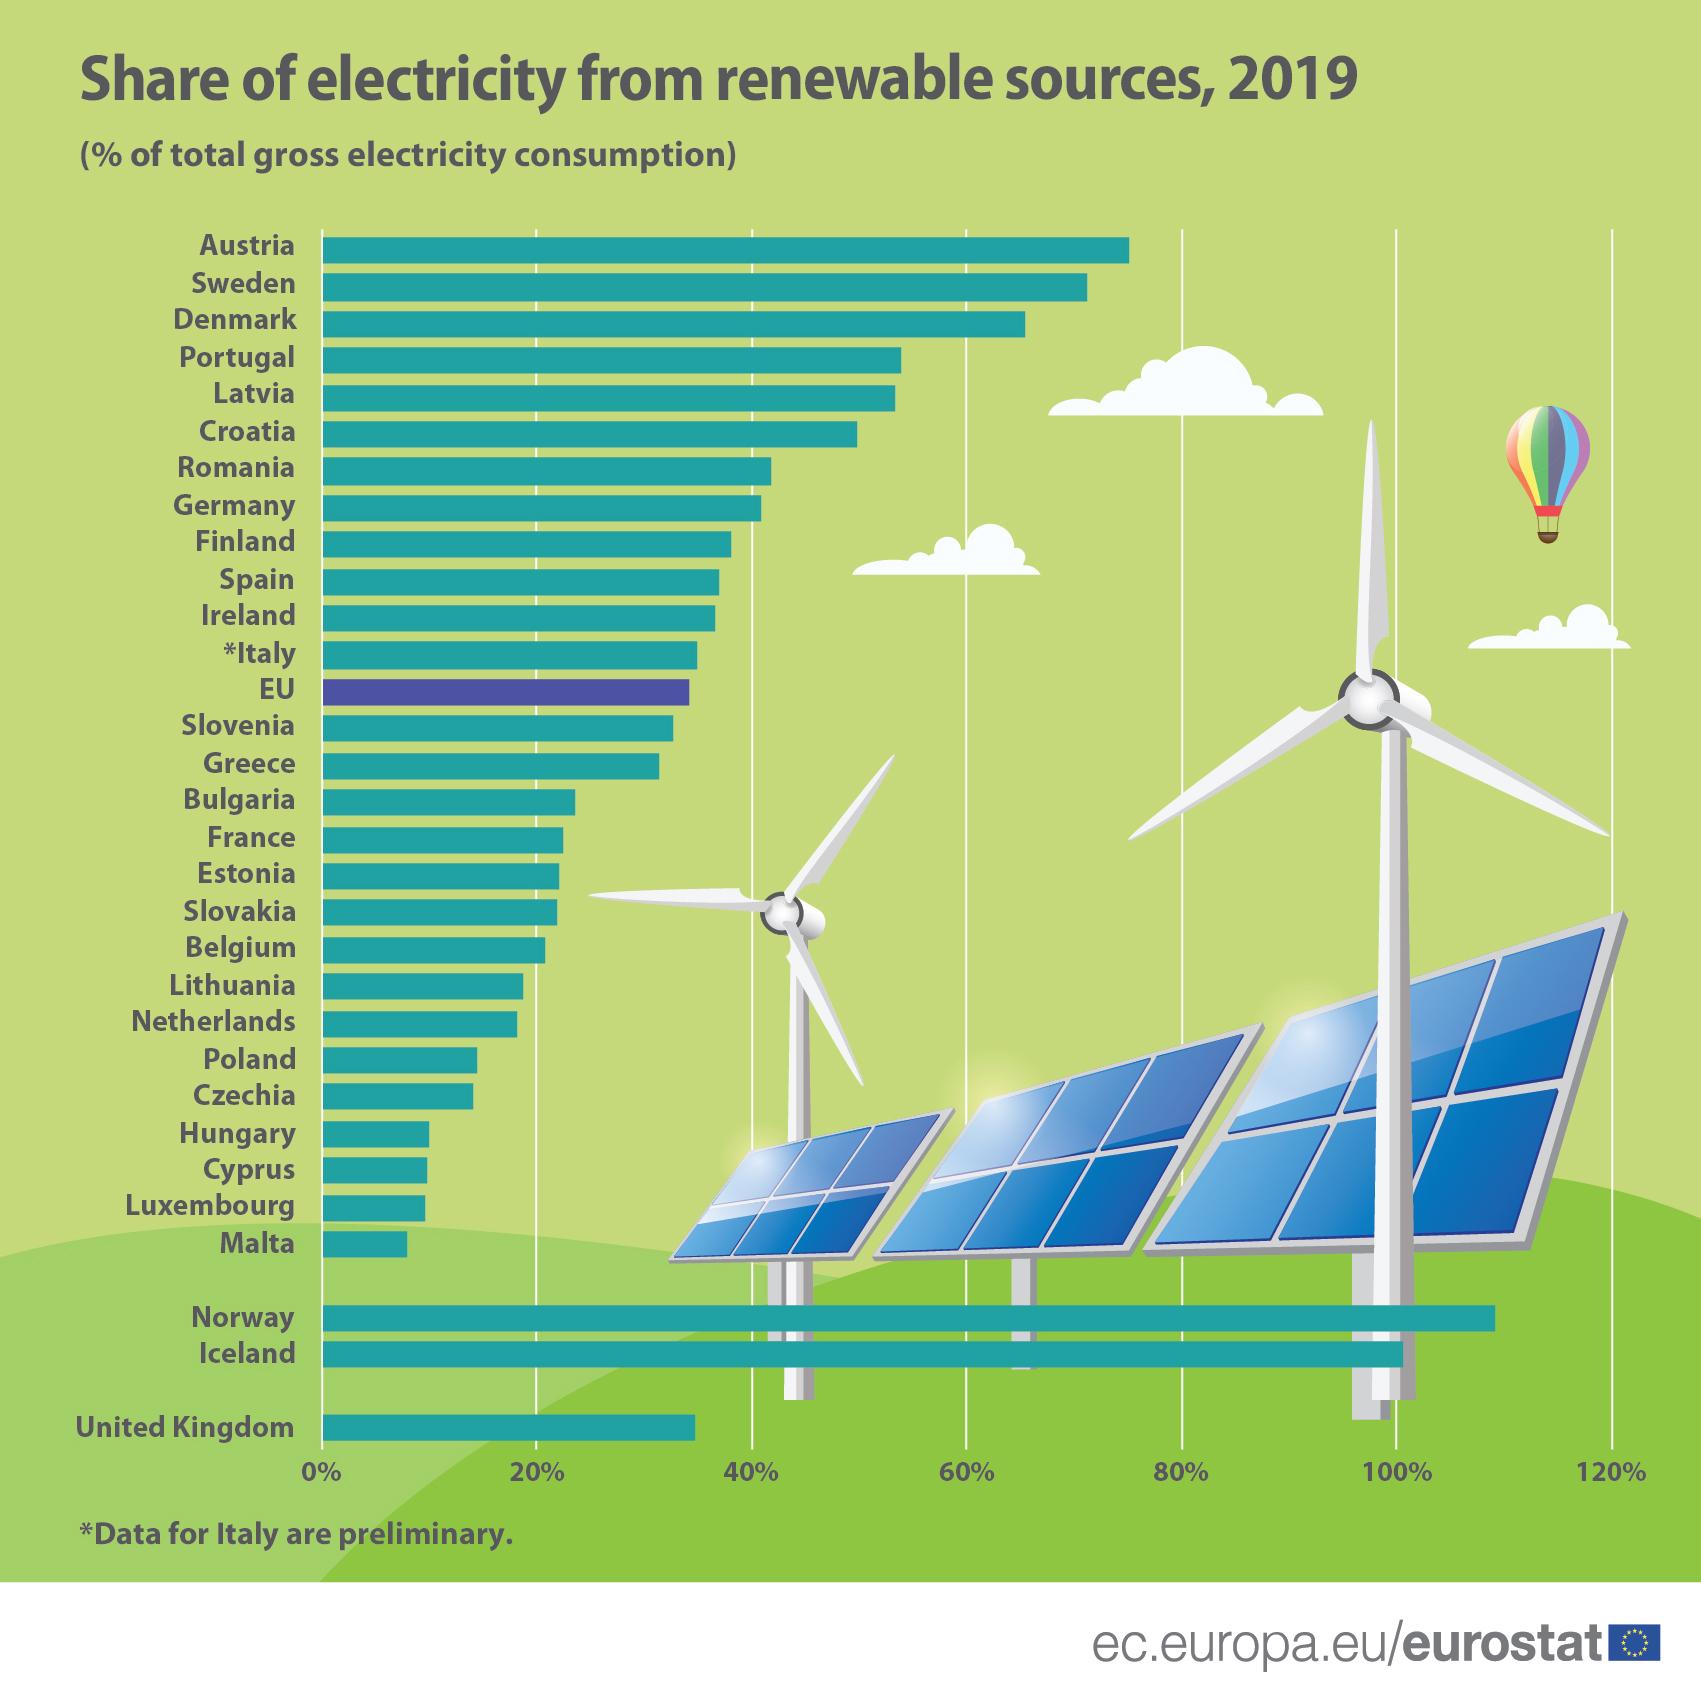 Quota di elettricità da fonti rinnovabili, 2019